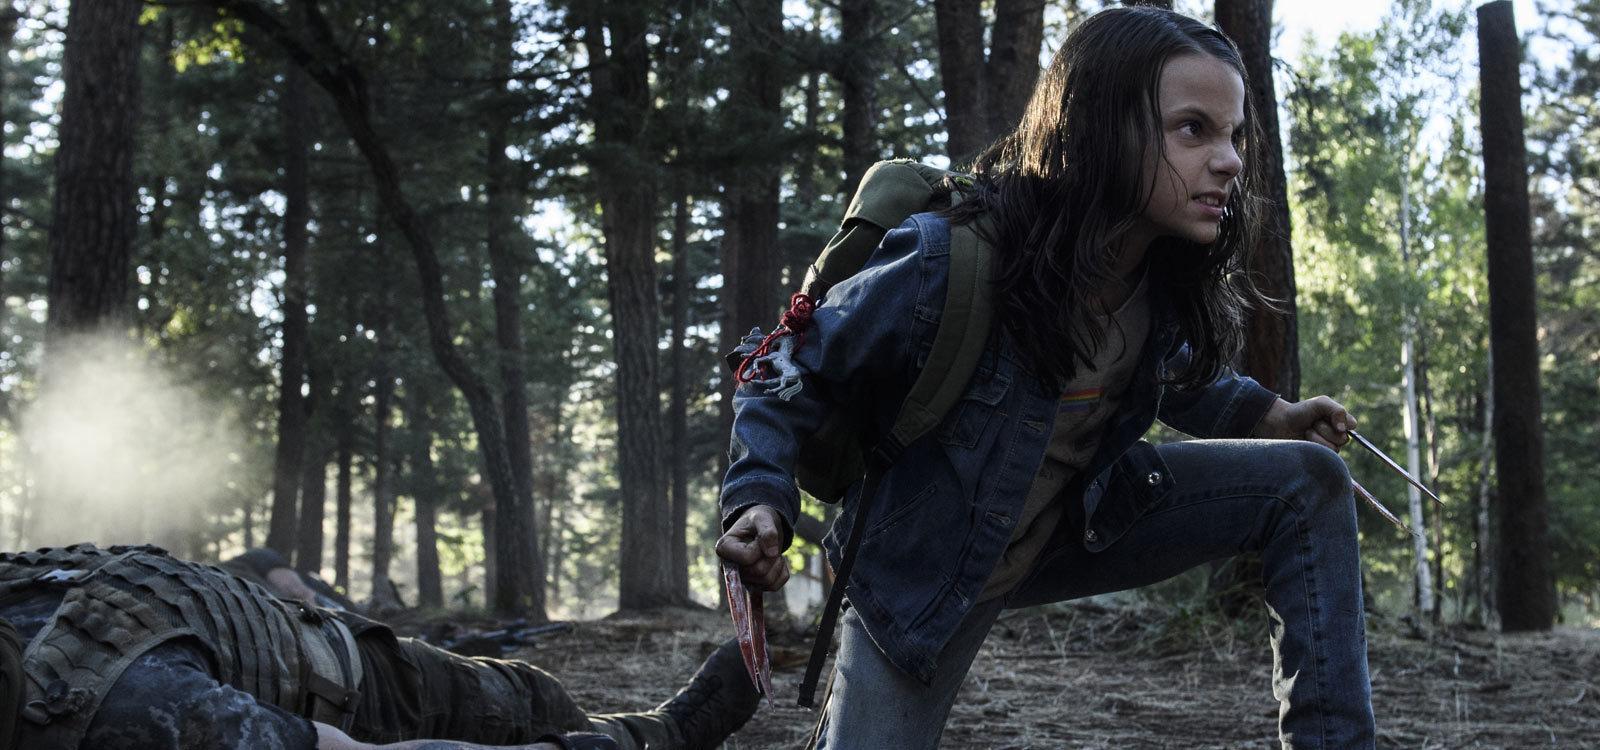 Dafne Keen in Logan (2017)